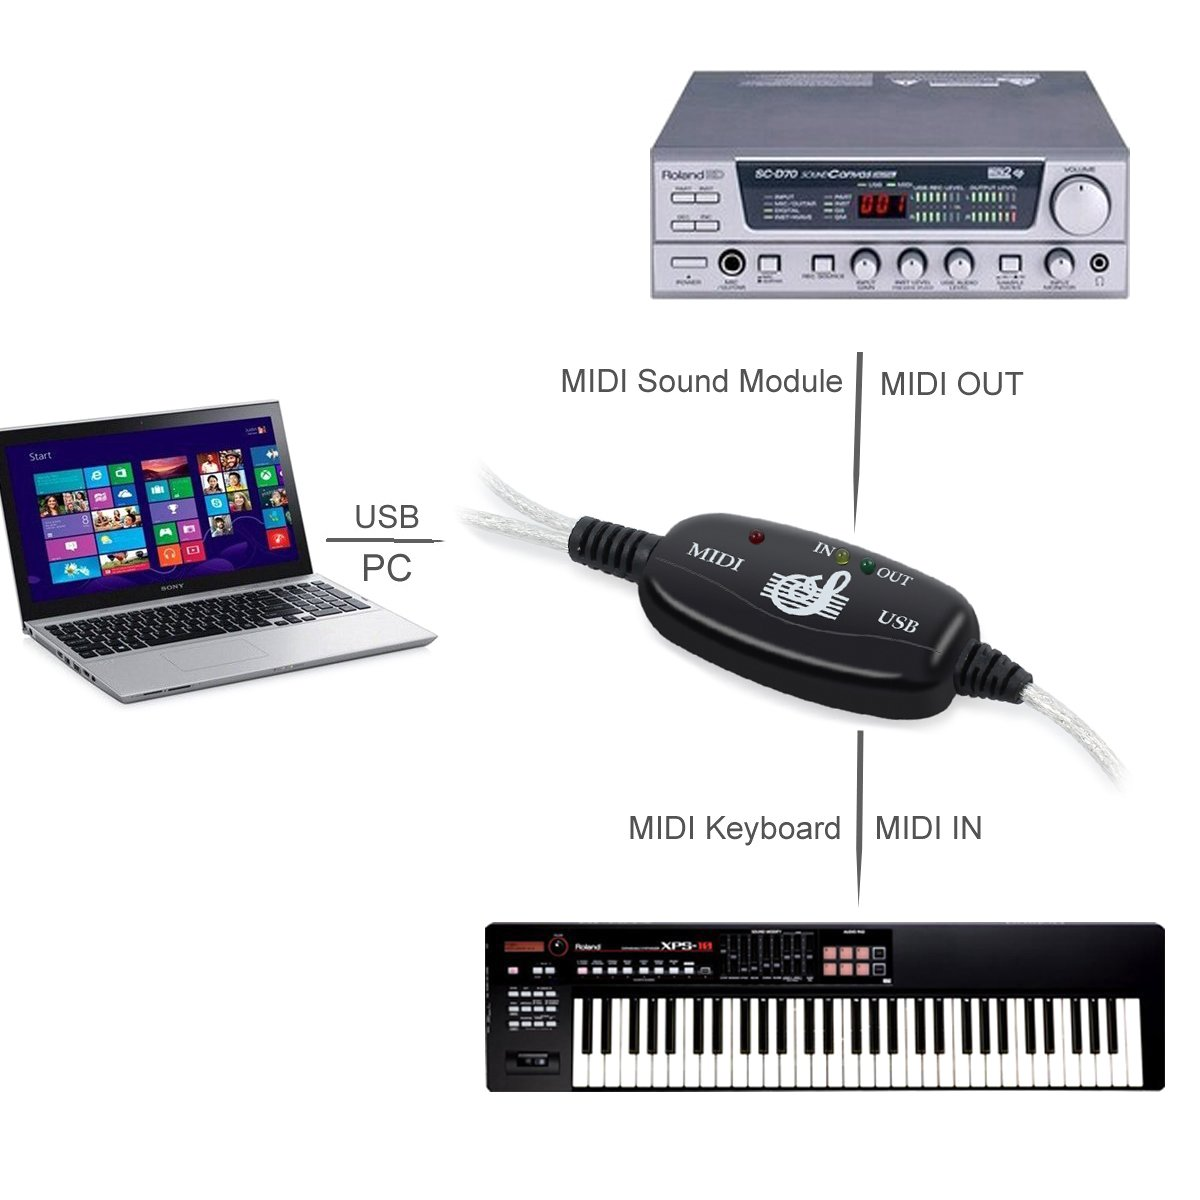 USB MIDI Adaptador 6Ft 2M USB a MIDI Interface Cable Convertidor-USB a Midi In-Out Convertidor Teclado musical Piano a PC Portátil para Win 7 Windows 2000 ...